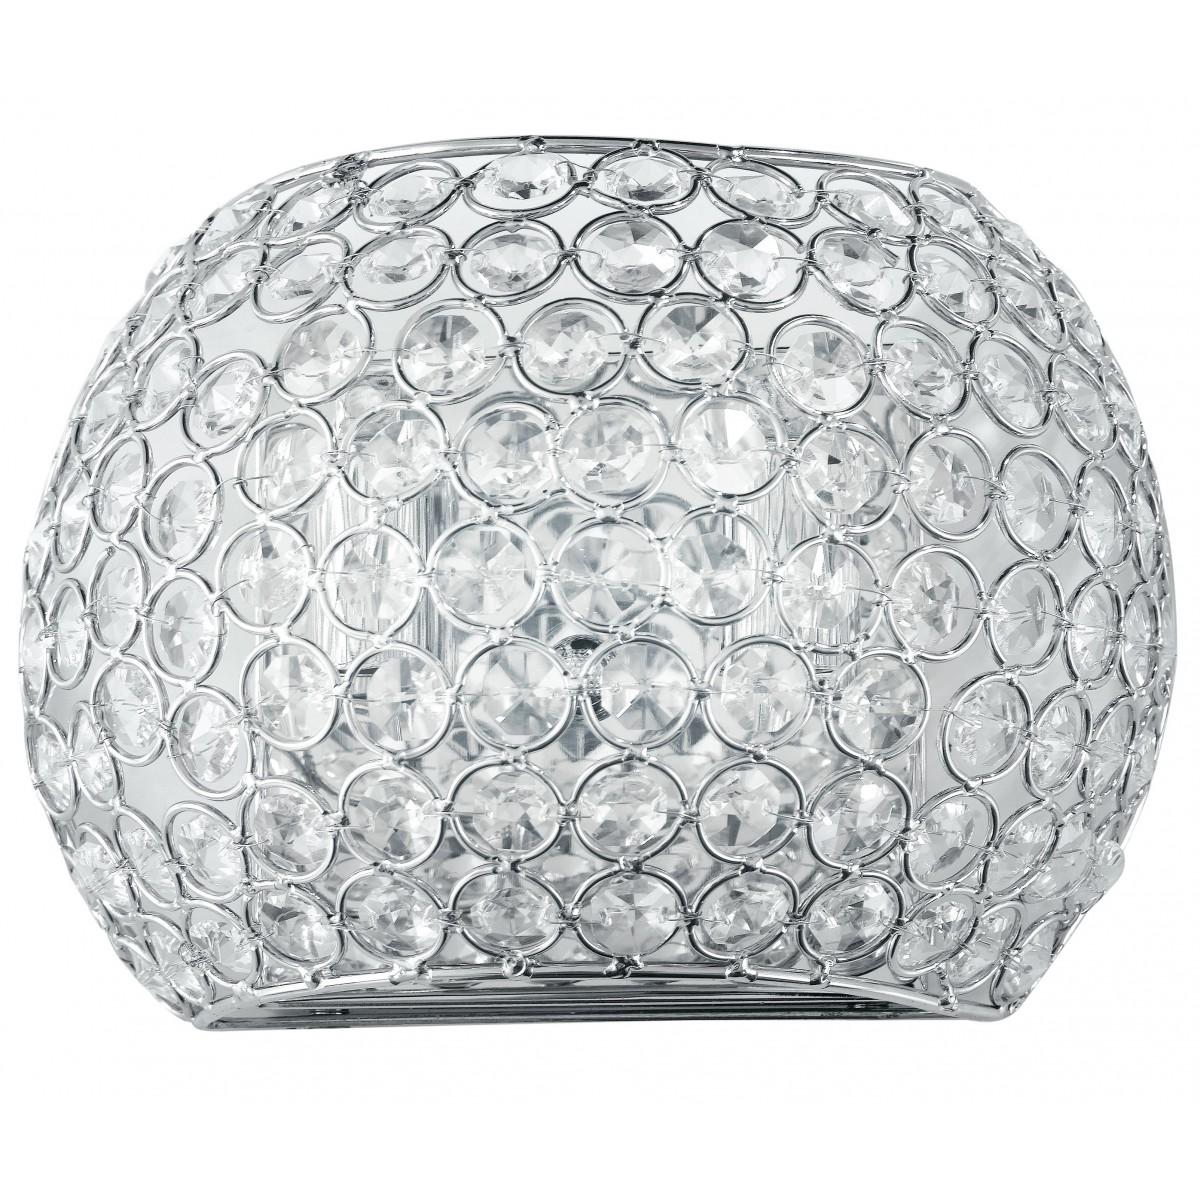 I-PLANET/AP - Applique Metallo Cromo Cristalli K9 Tondi Lampada Elegante G9